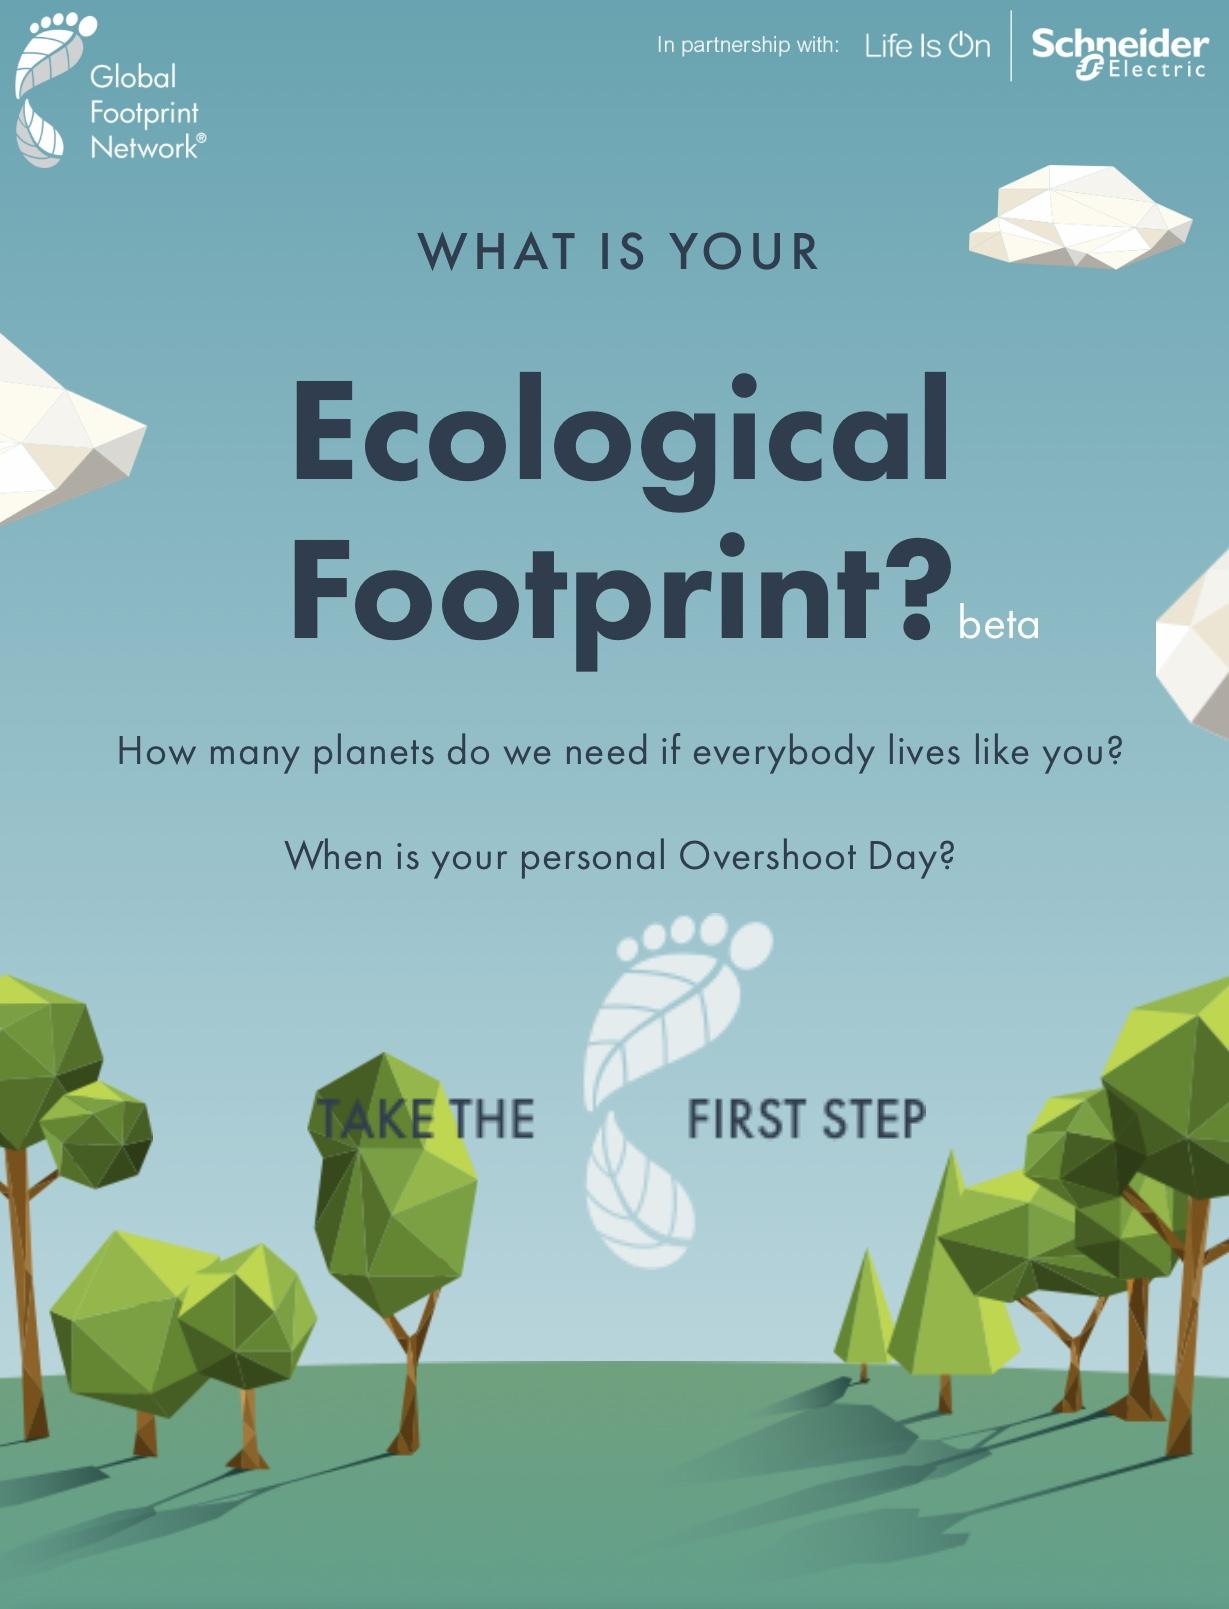 http://www.footprintcalculator.org